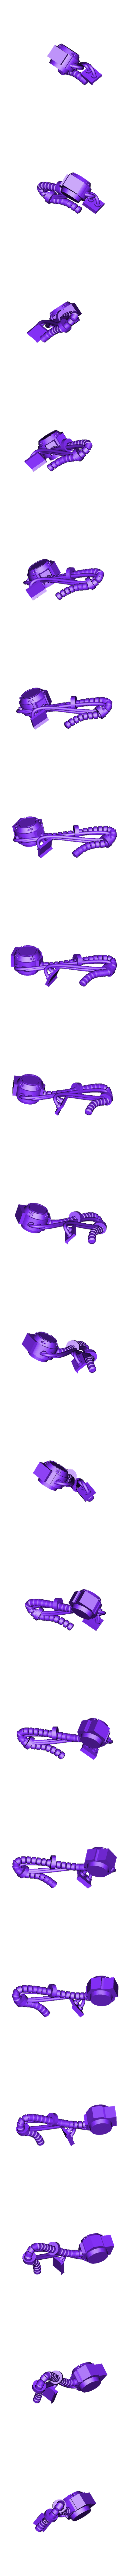 Aggressor_2_Left_hoses.stl Download free STL file Flame Armed Instigators • 3D printable template, danny_cyanide